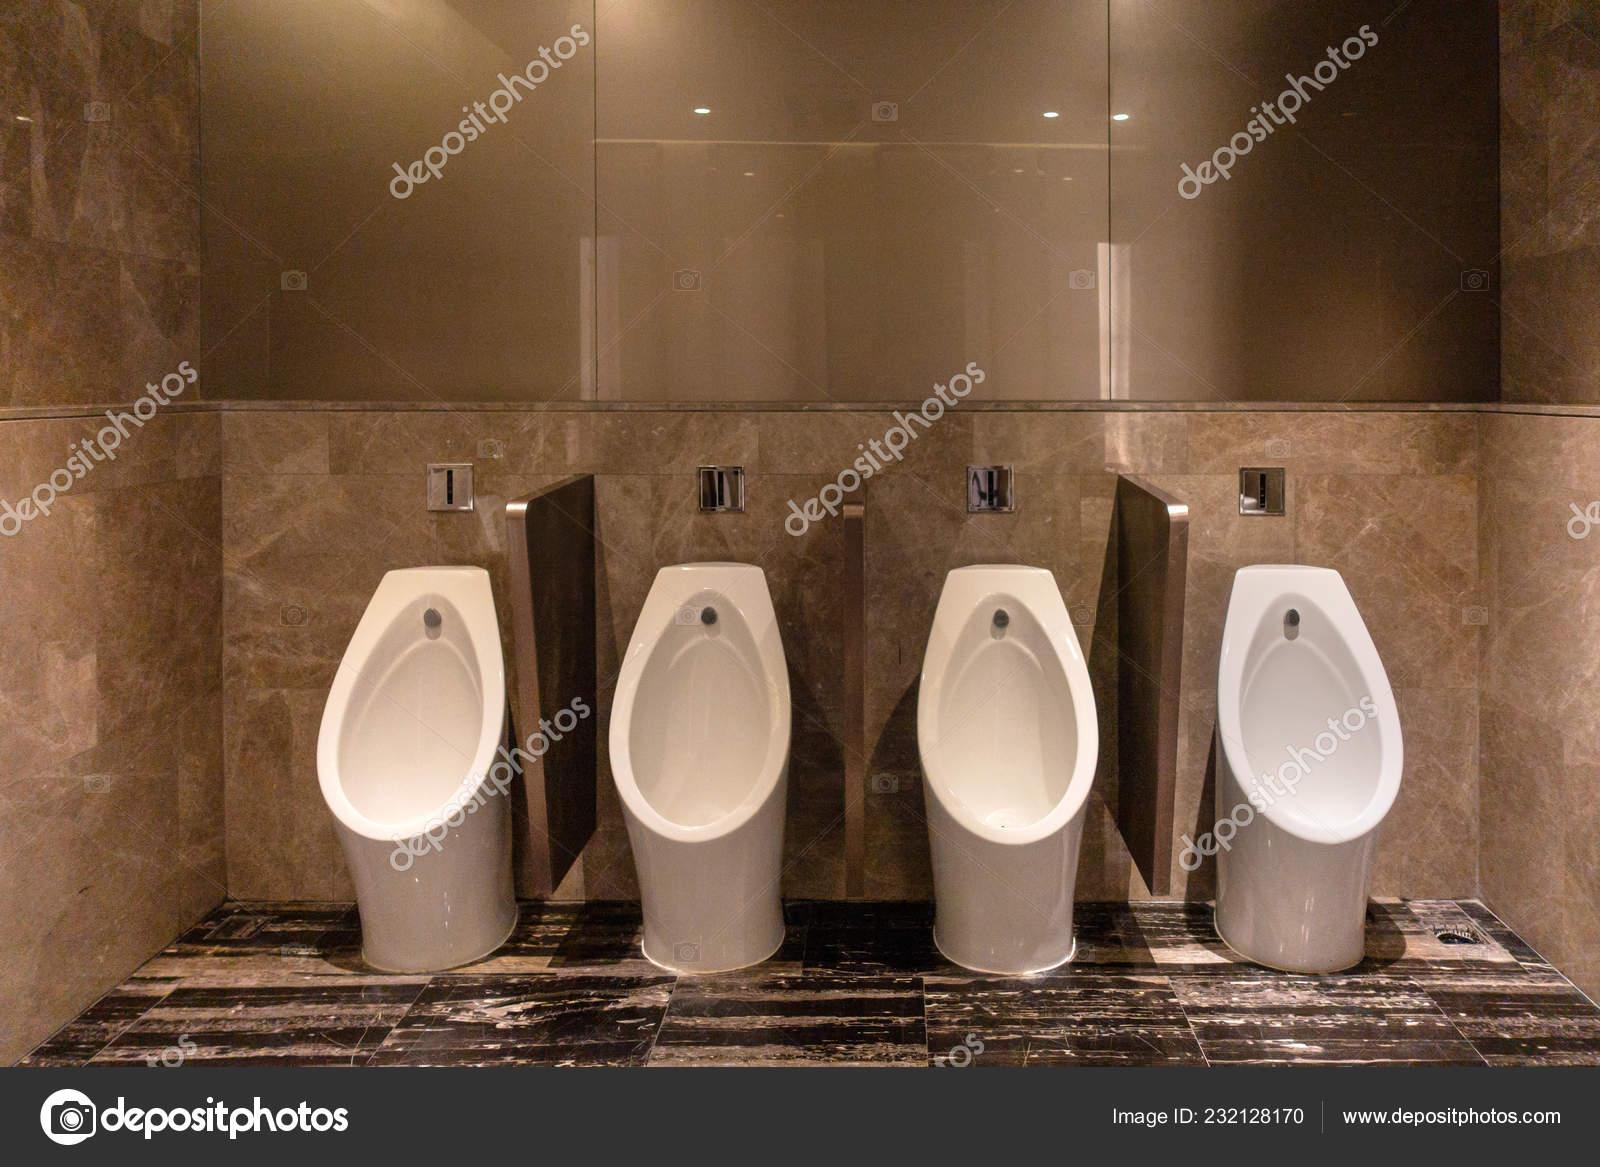 Row Modern Urinals Men Public Toilet Room Public Toilet Restroom Stock Photo C Tampatra Hotmail Com 232128170